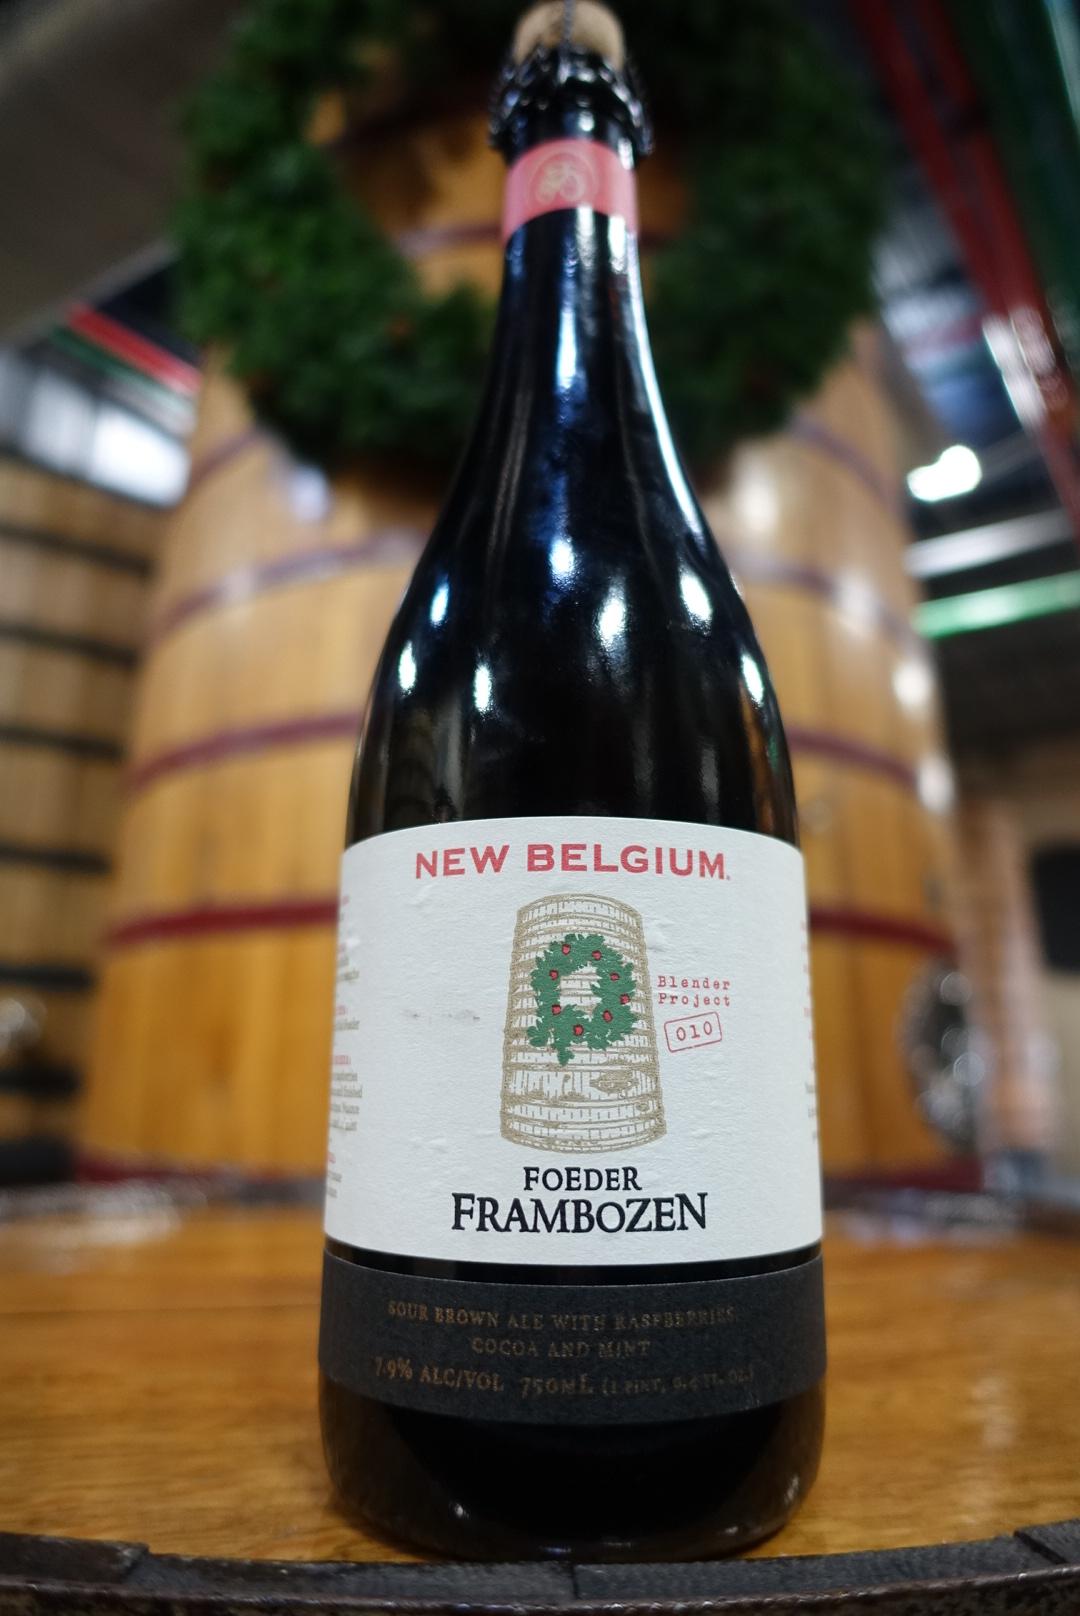 New Belgium Brewing Foeder Frambozen